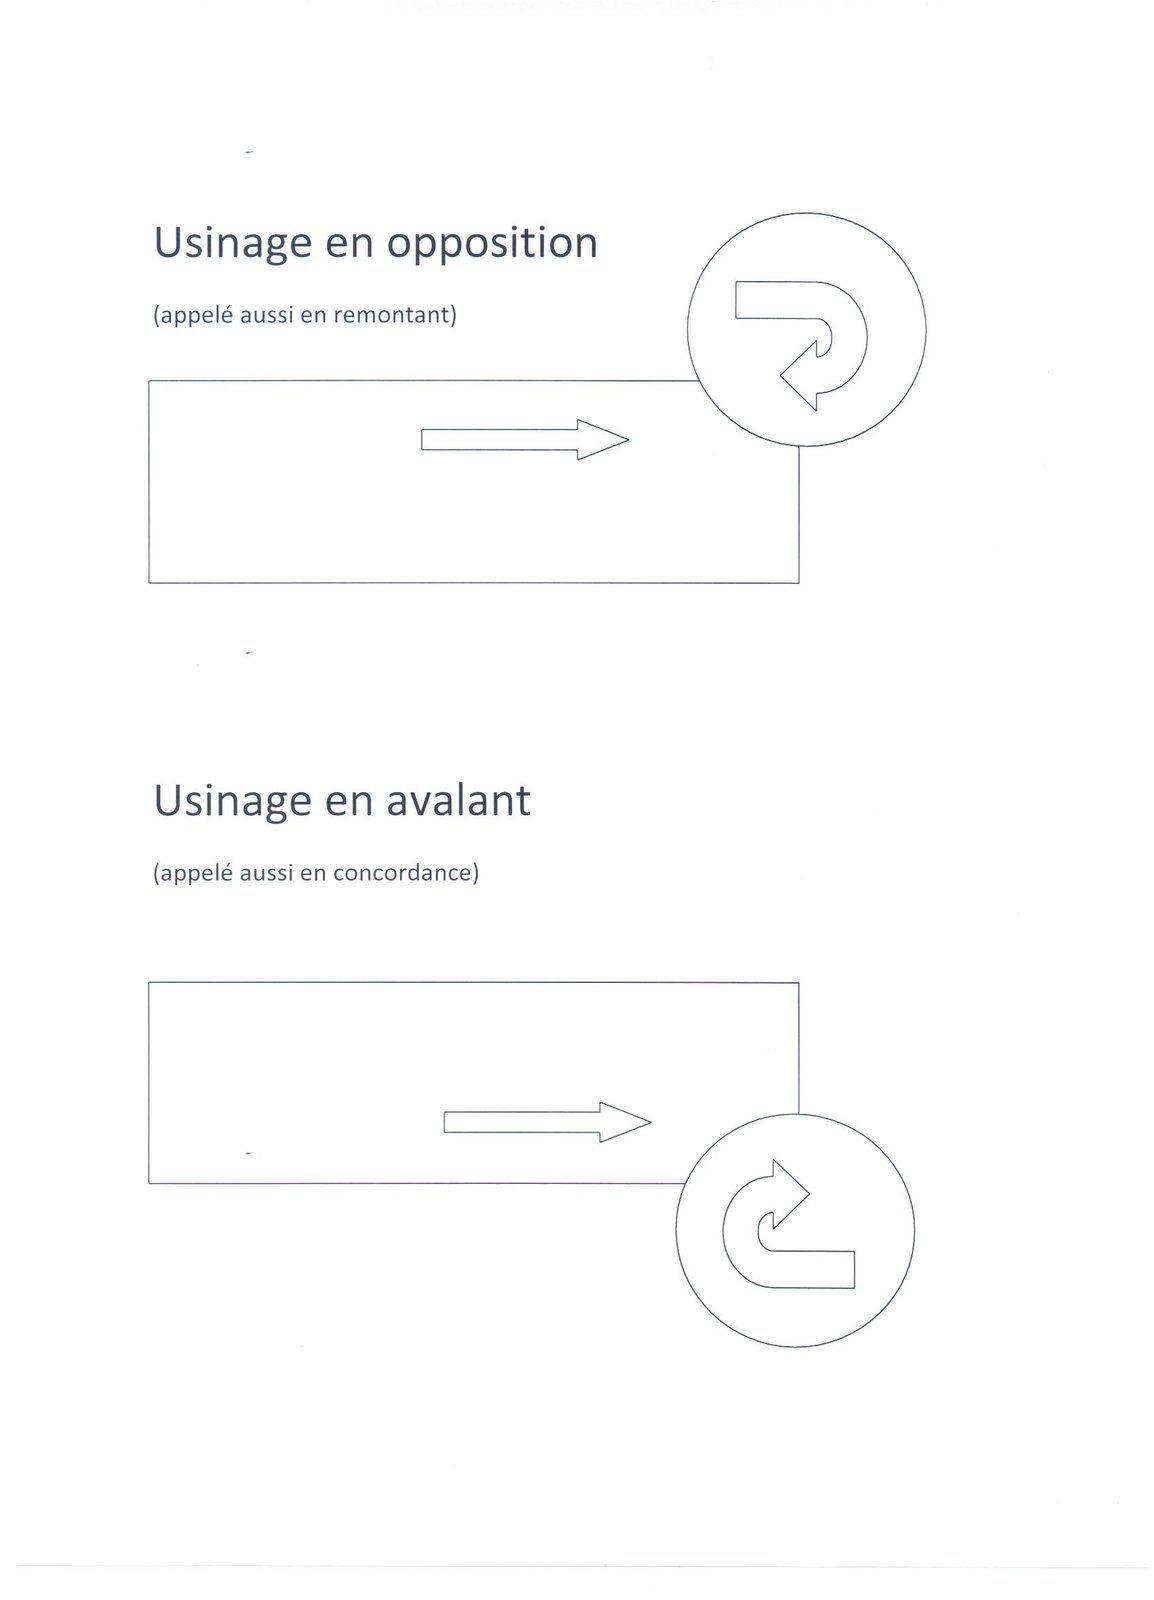 usinage.jpg